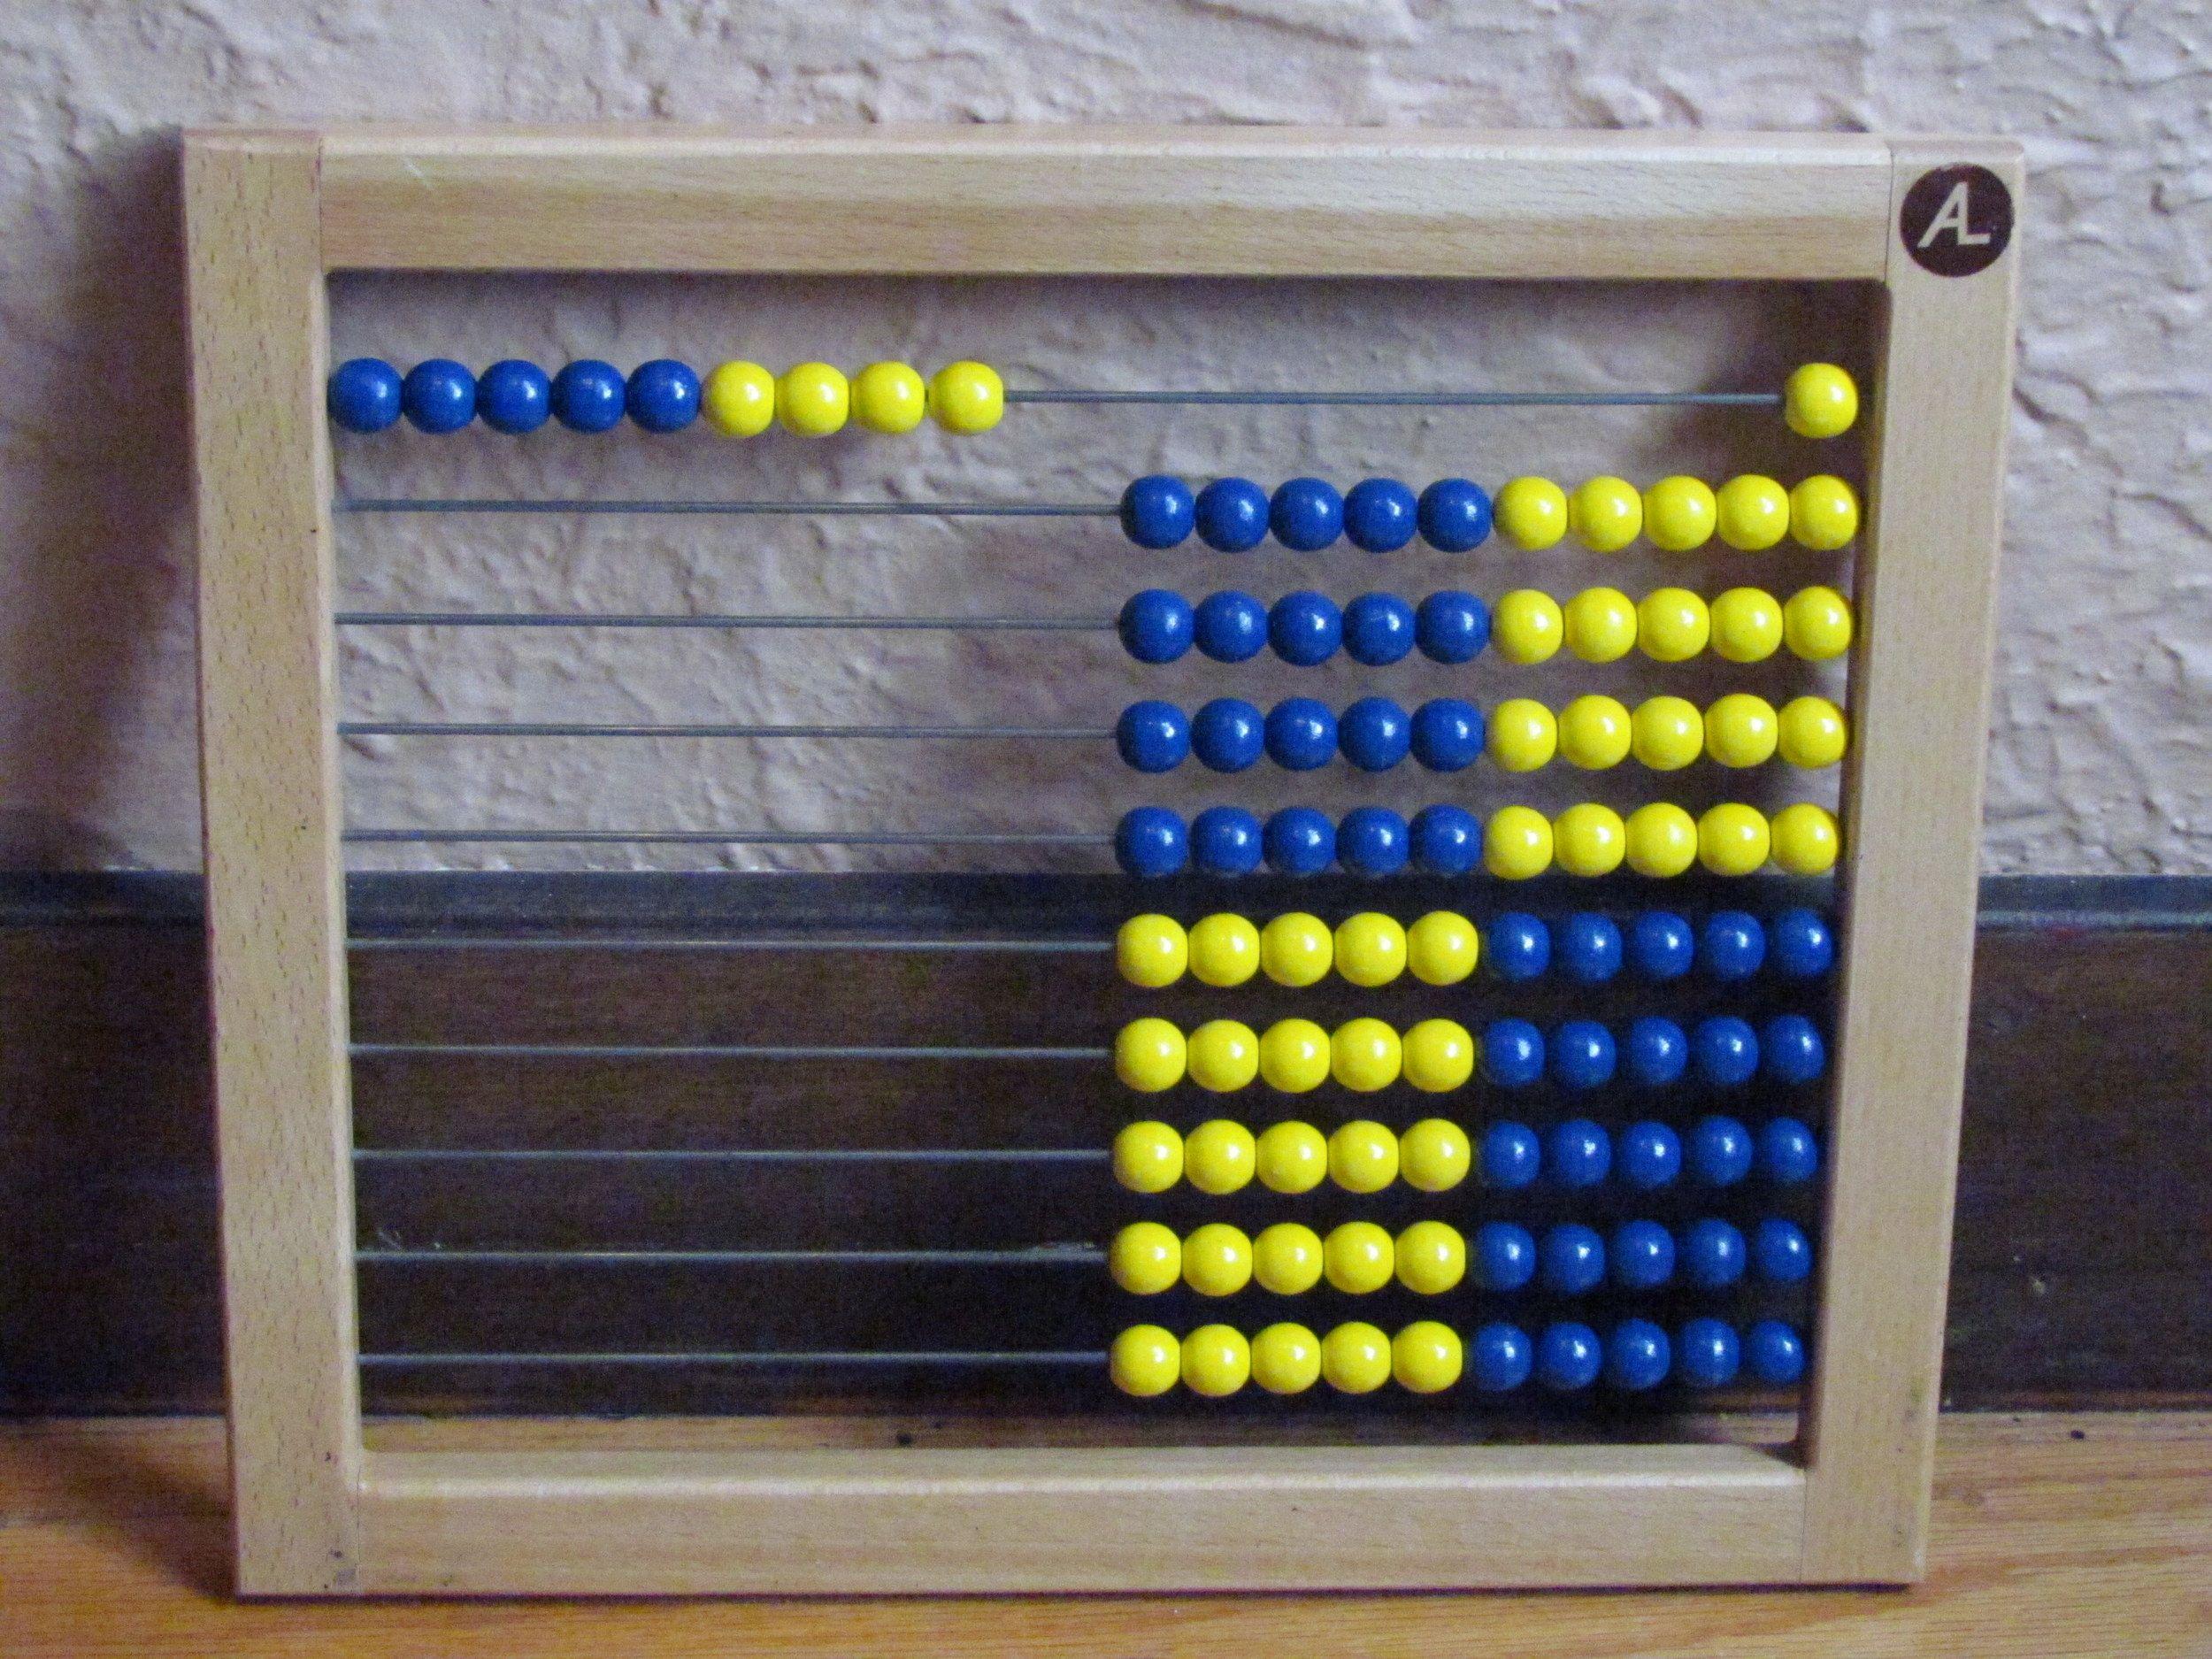 The Al Abacus My Favorite Homeschool Math Manipulative